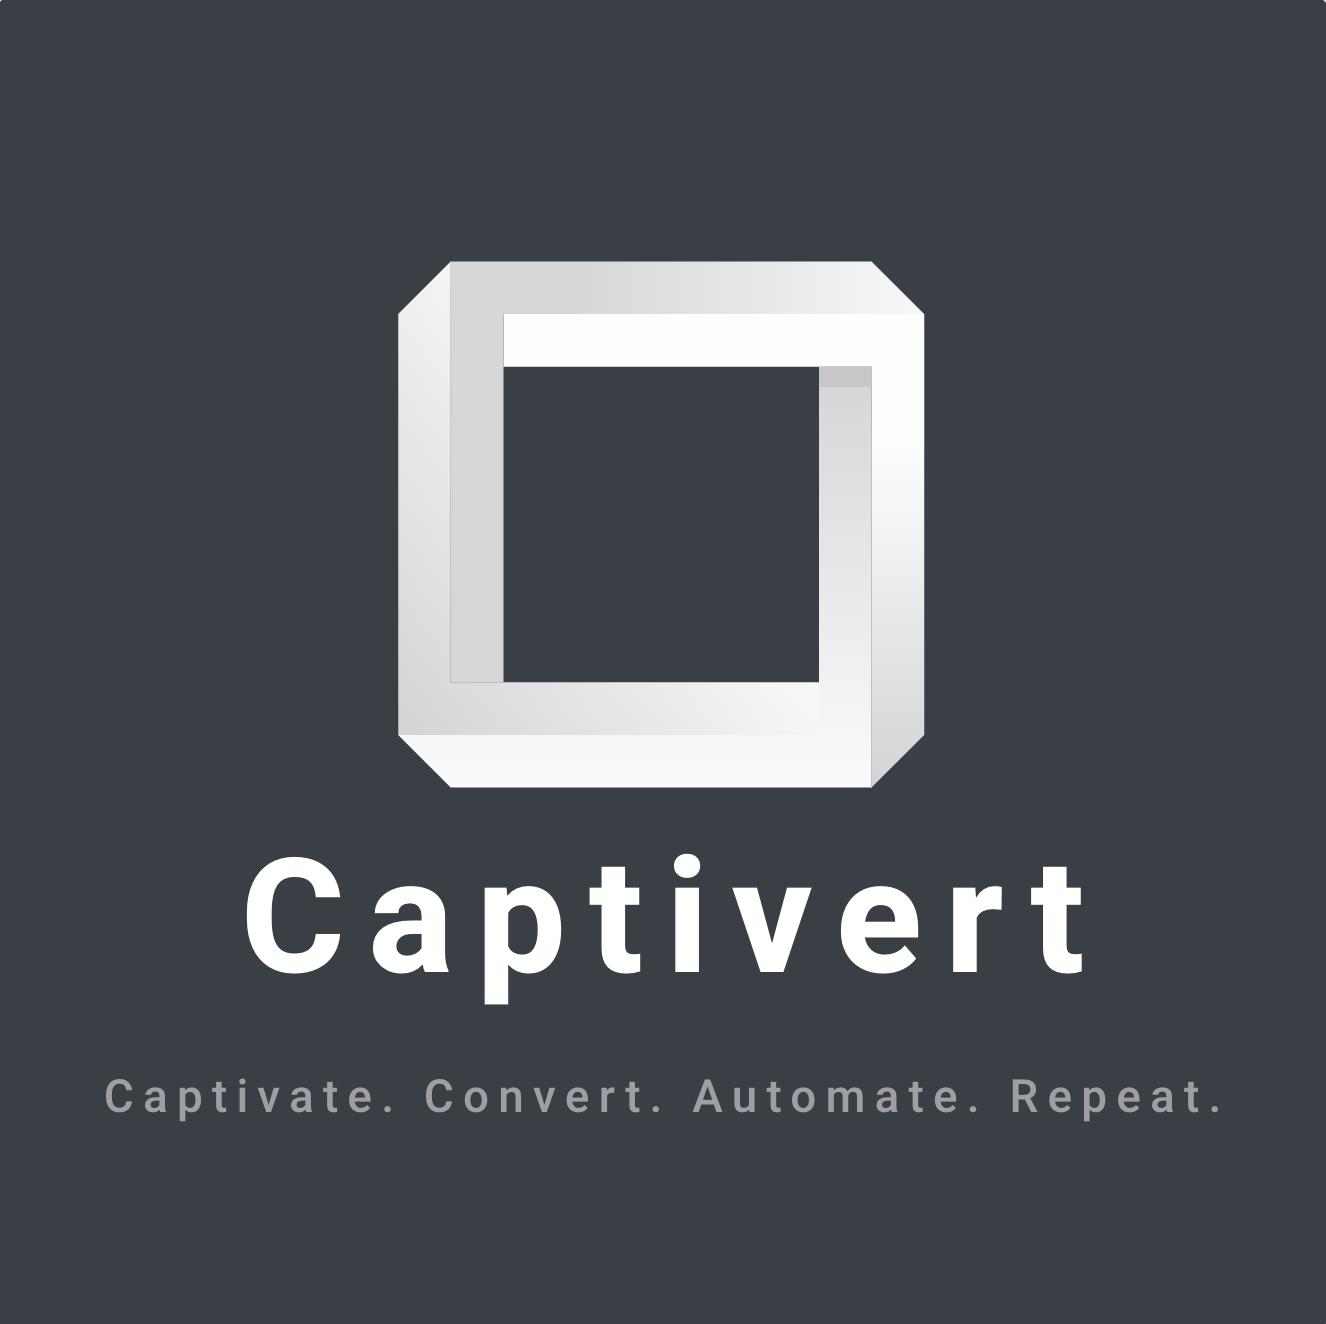 Captivert